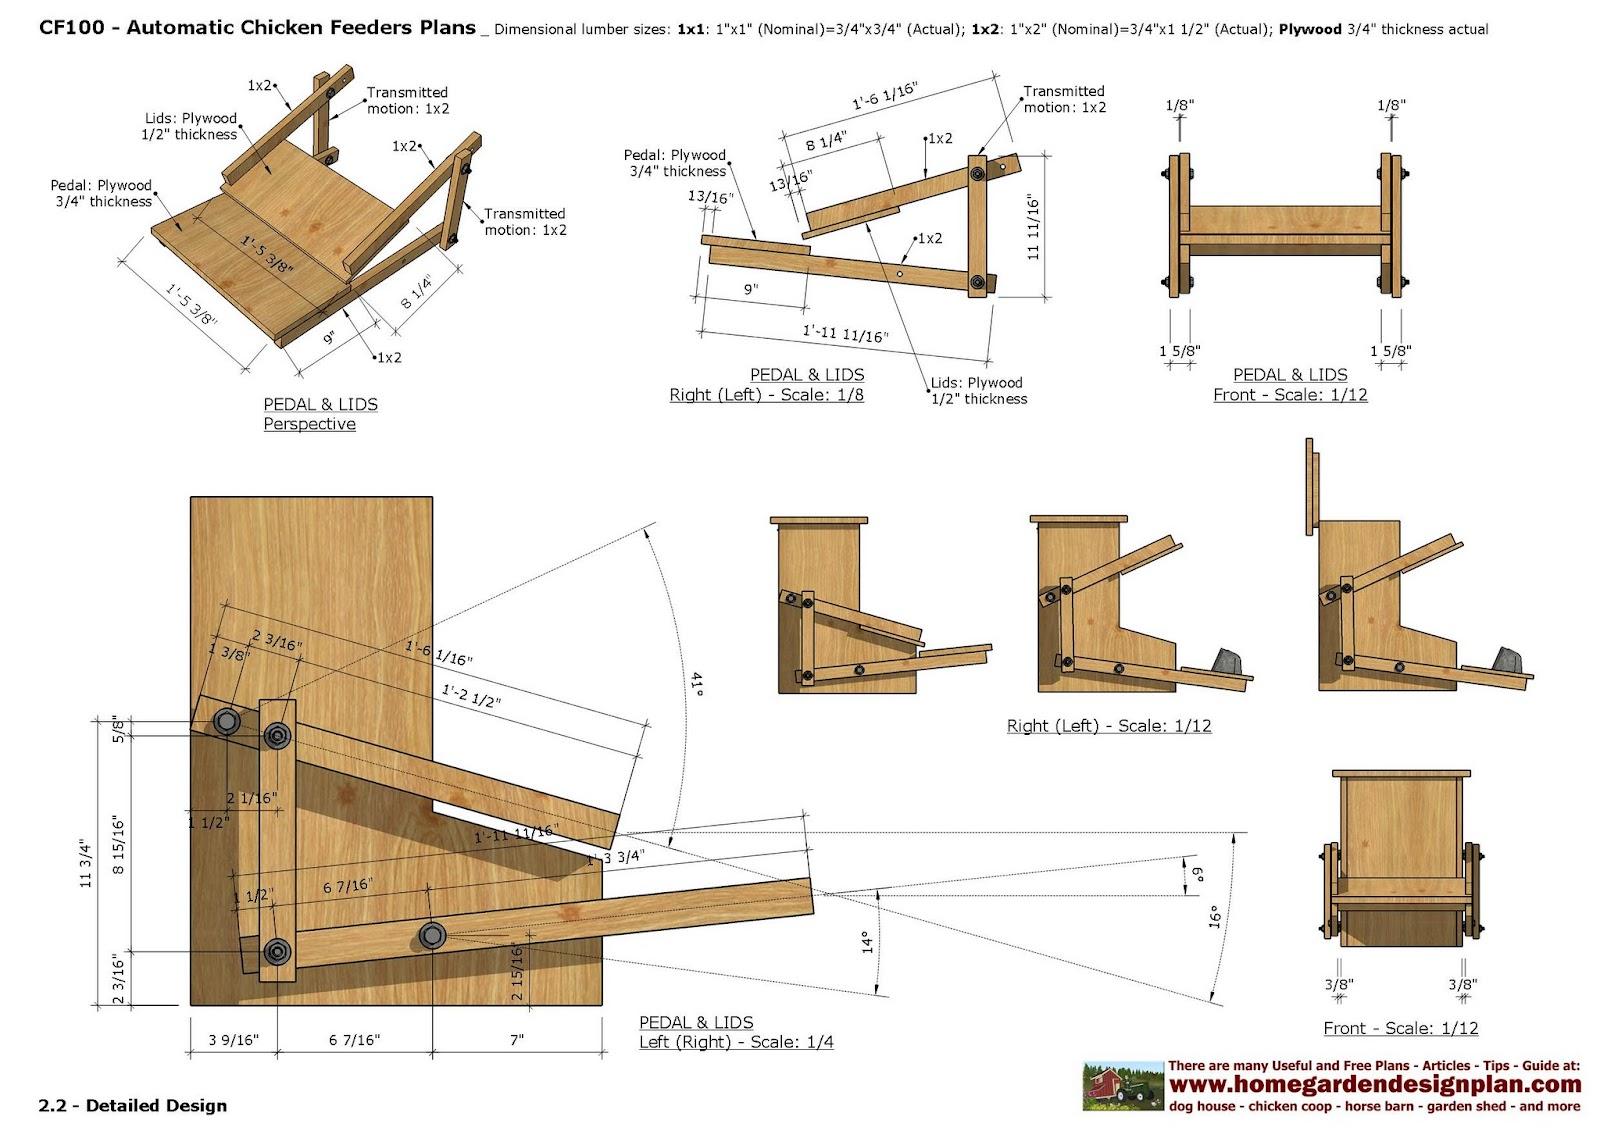 Home Garden Plans Cf Chicken Feeder Plans Construction